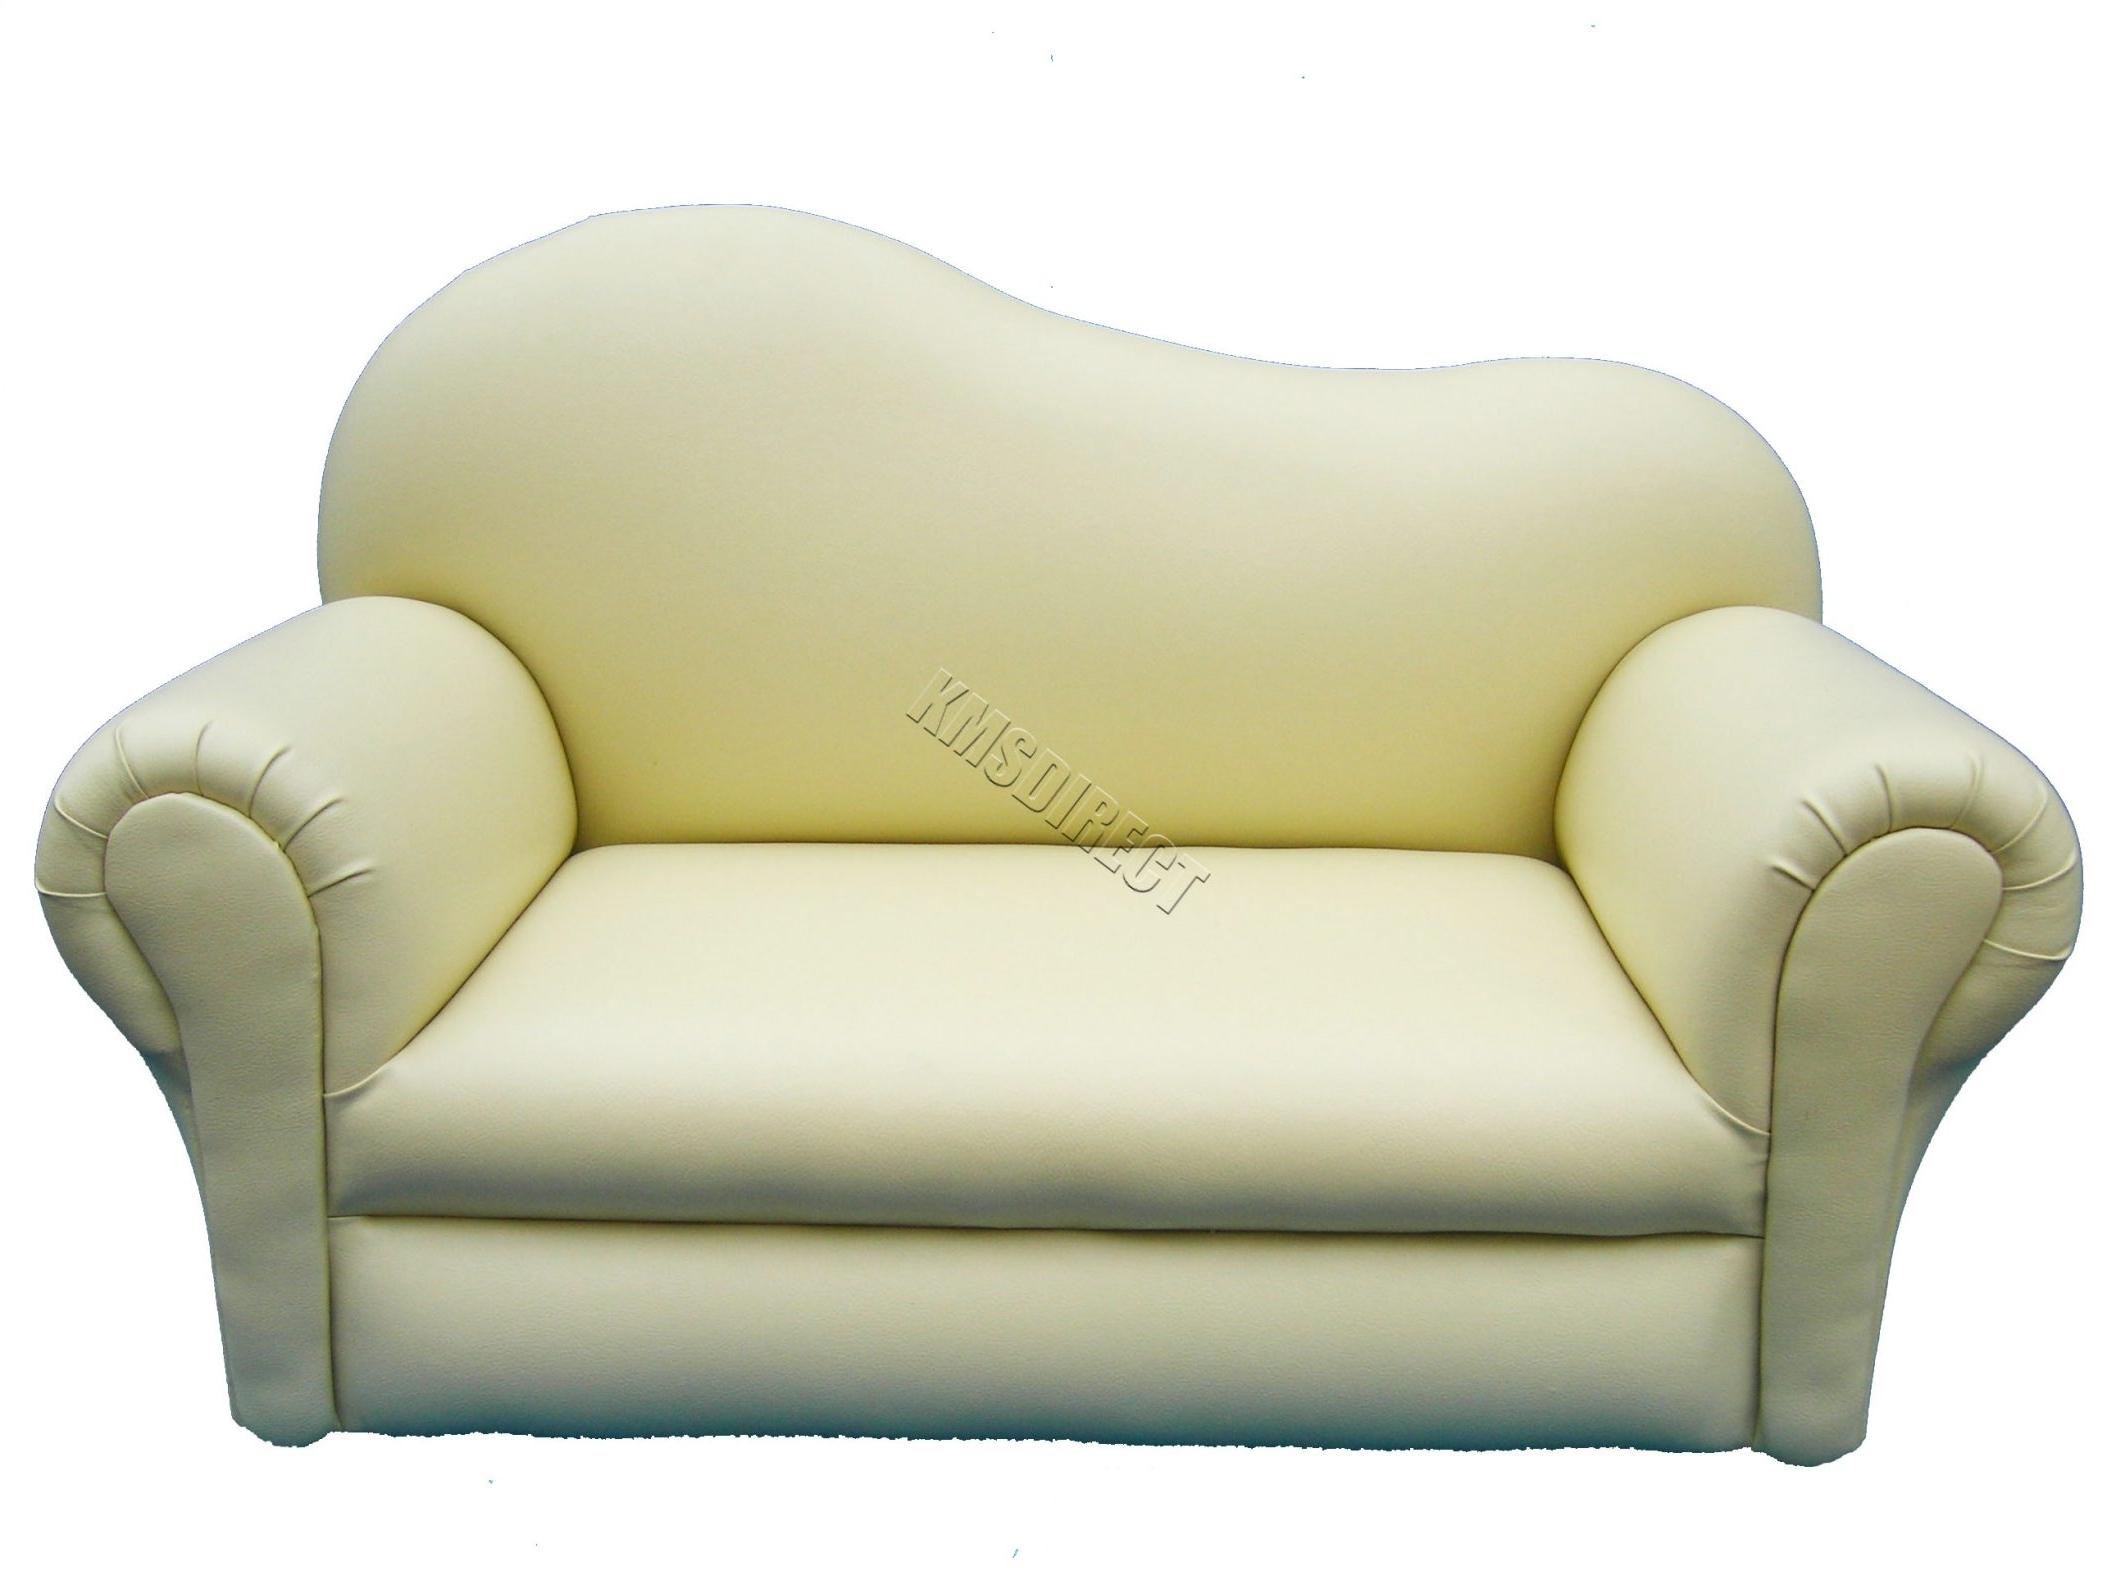 Favorite Sofa : Kids Furniture Sofa Children's Flip Chair Mini Sofa Bed Regarding Childrens Sofas (View 13 of 20)